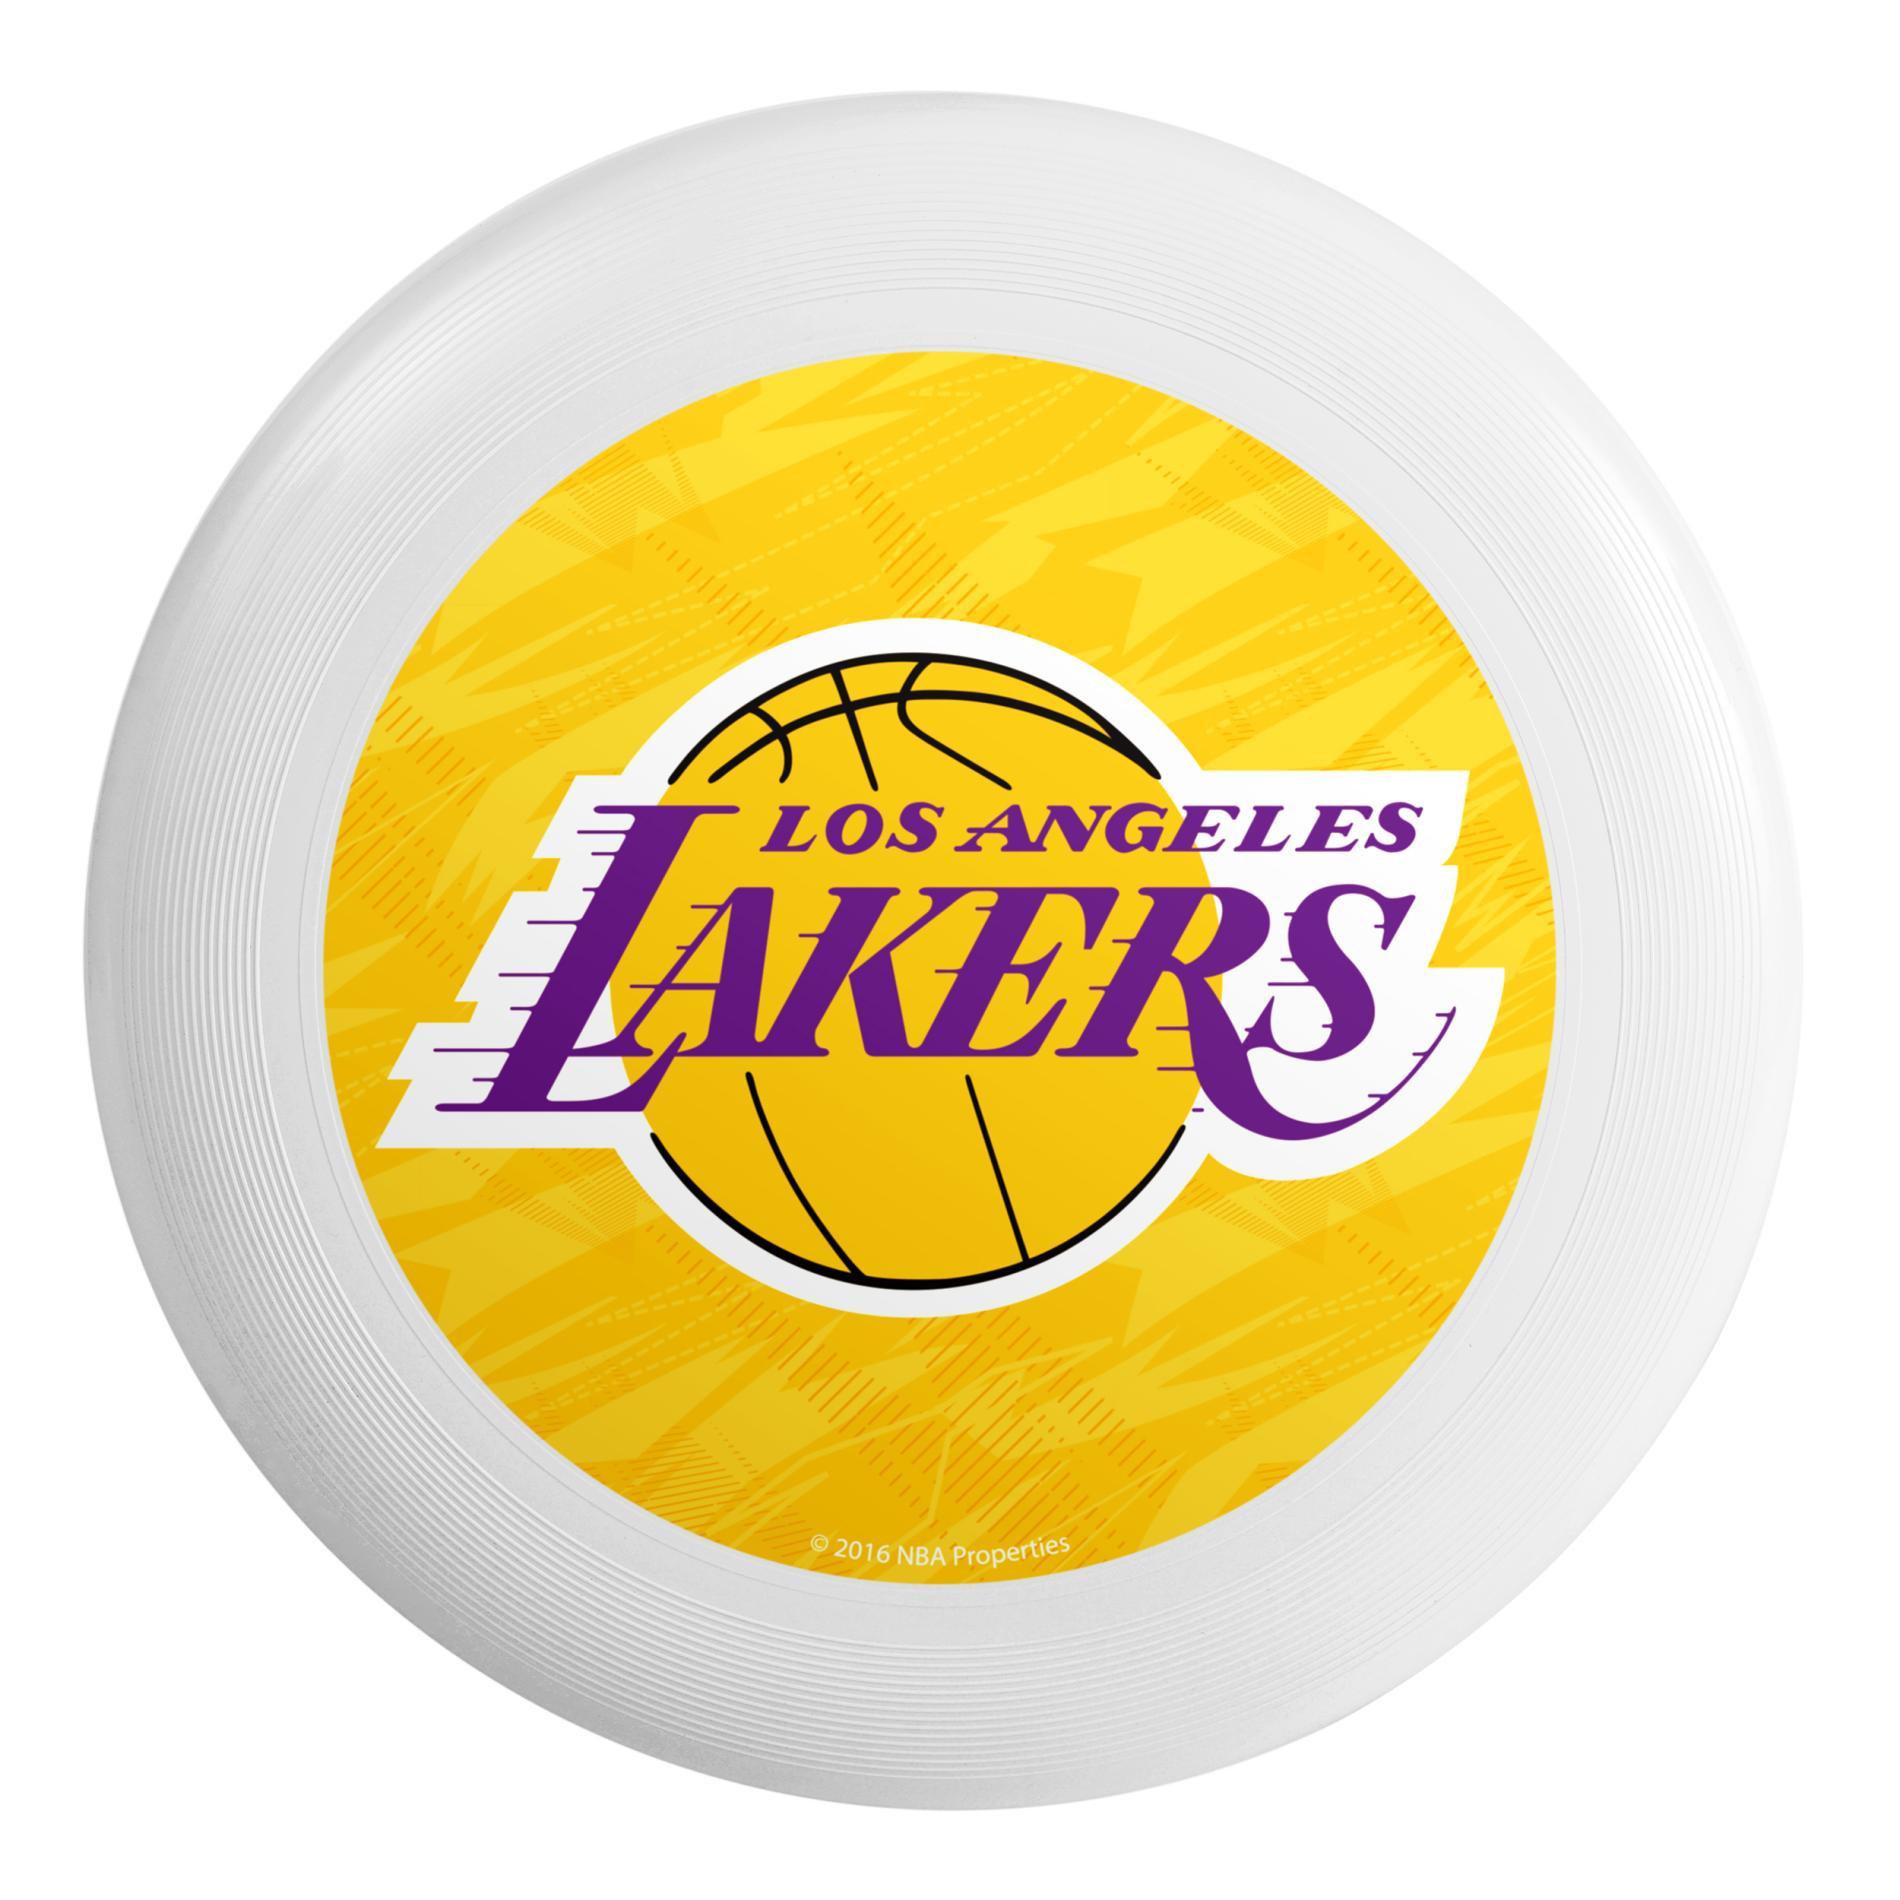 NBA(CANONICAL) Flying Disc - Los Angeles Lakers PartNumber: 046W008743624001P KsnValue: 8743624 MfgPartNumber: DSCNBHETLSRLAL